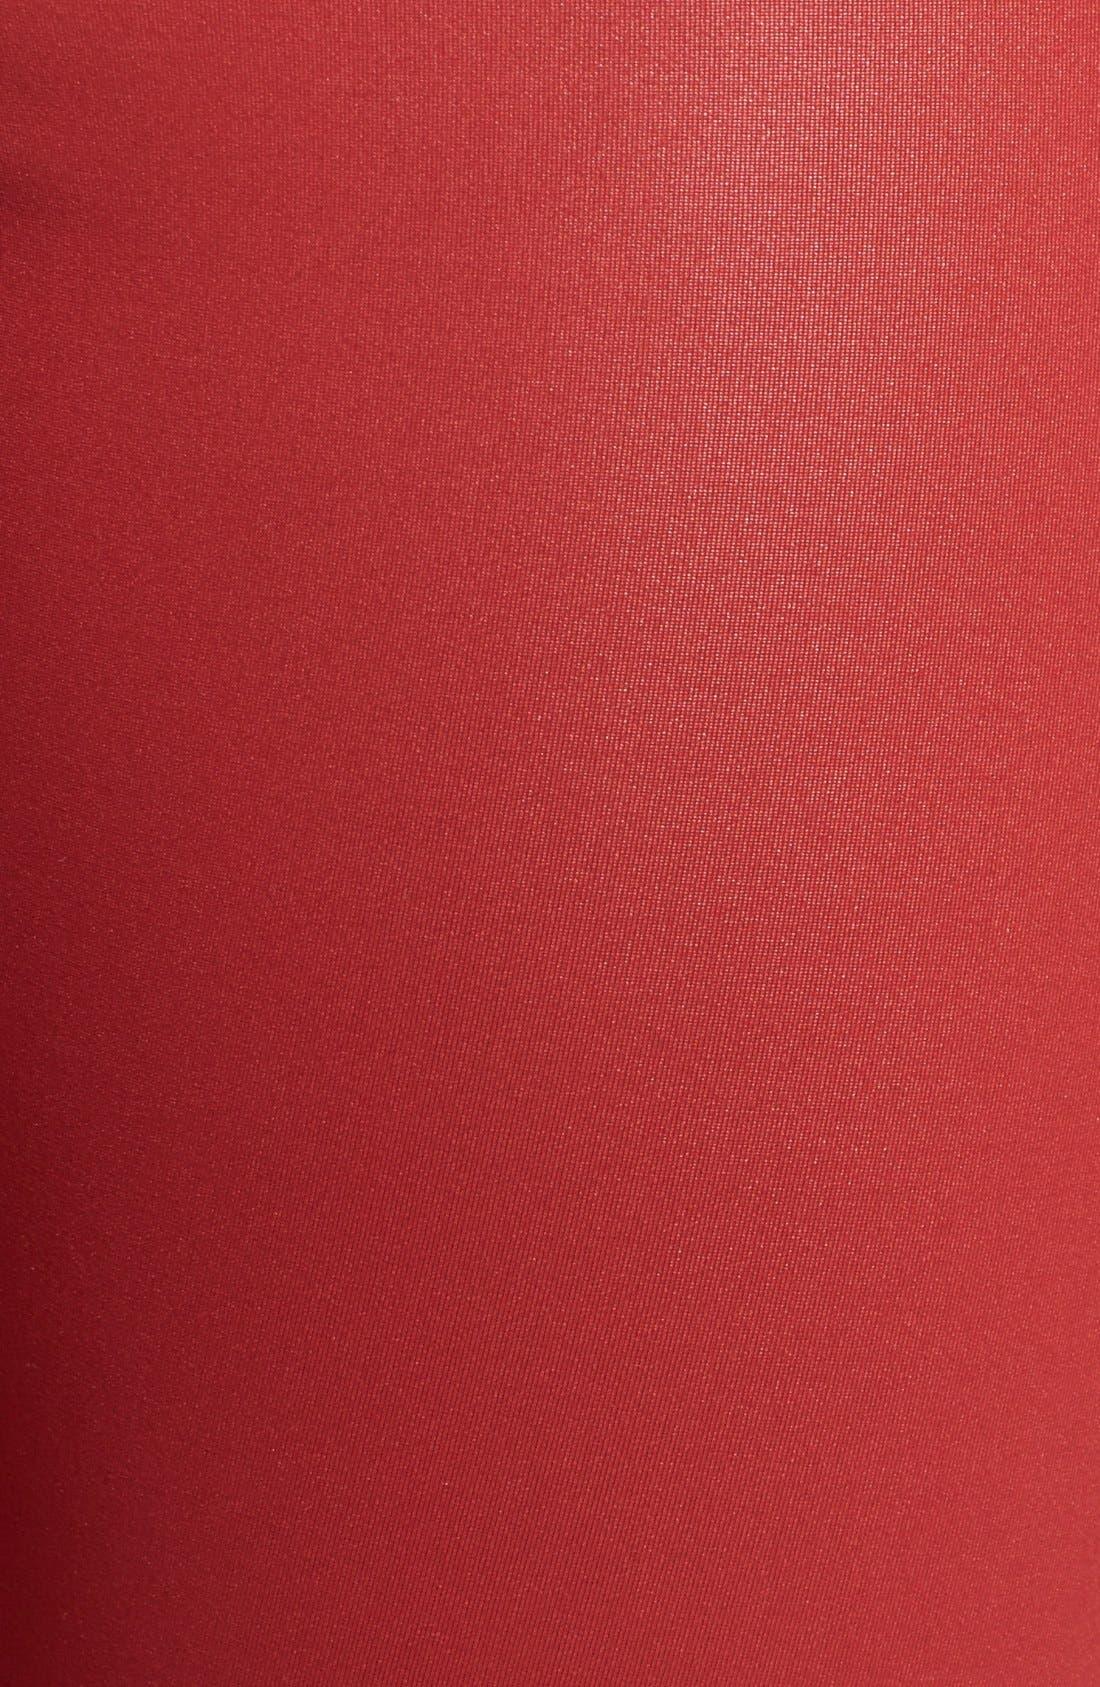 Alternate Image 3  - adidas by Stella McCartney Run Performance Tights